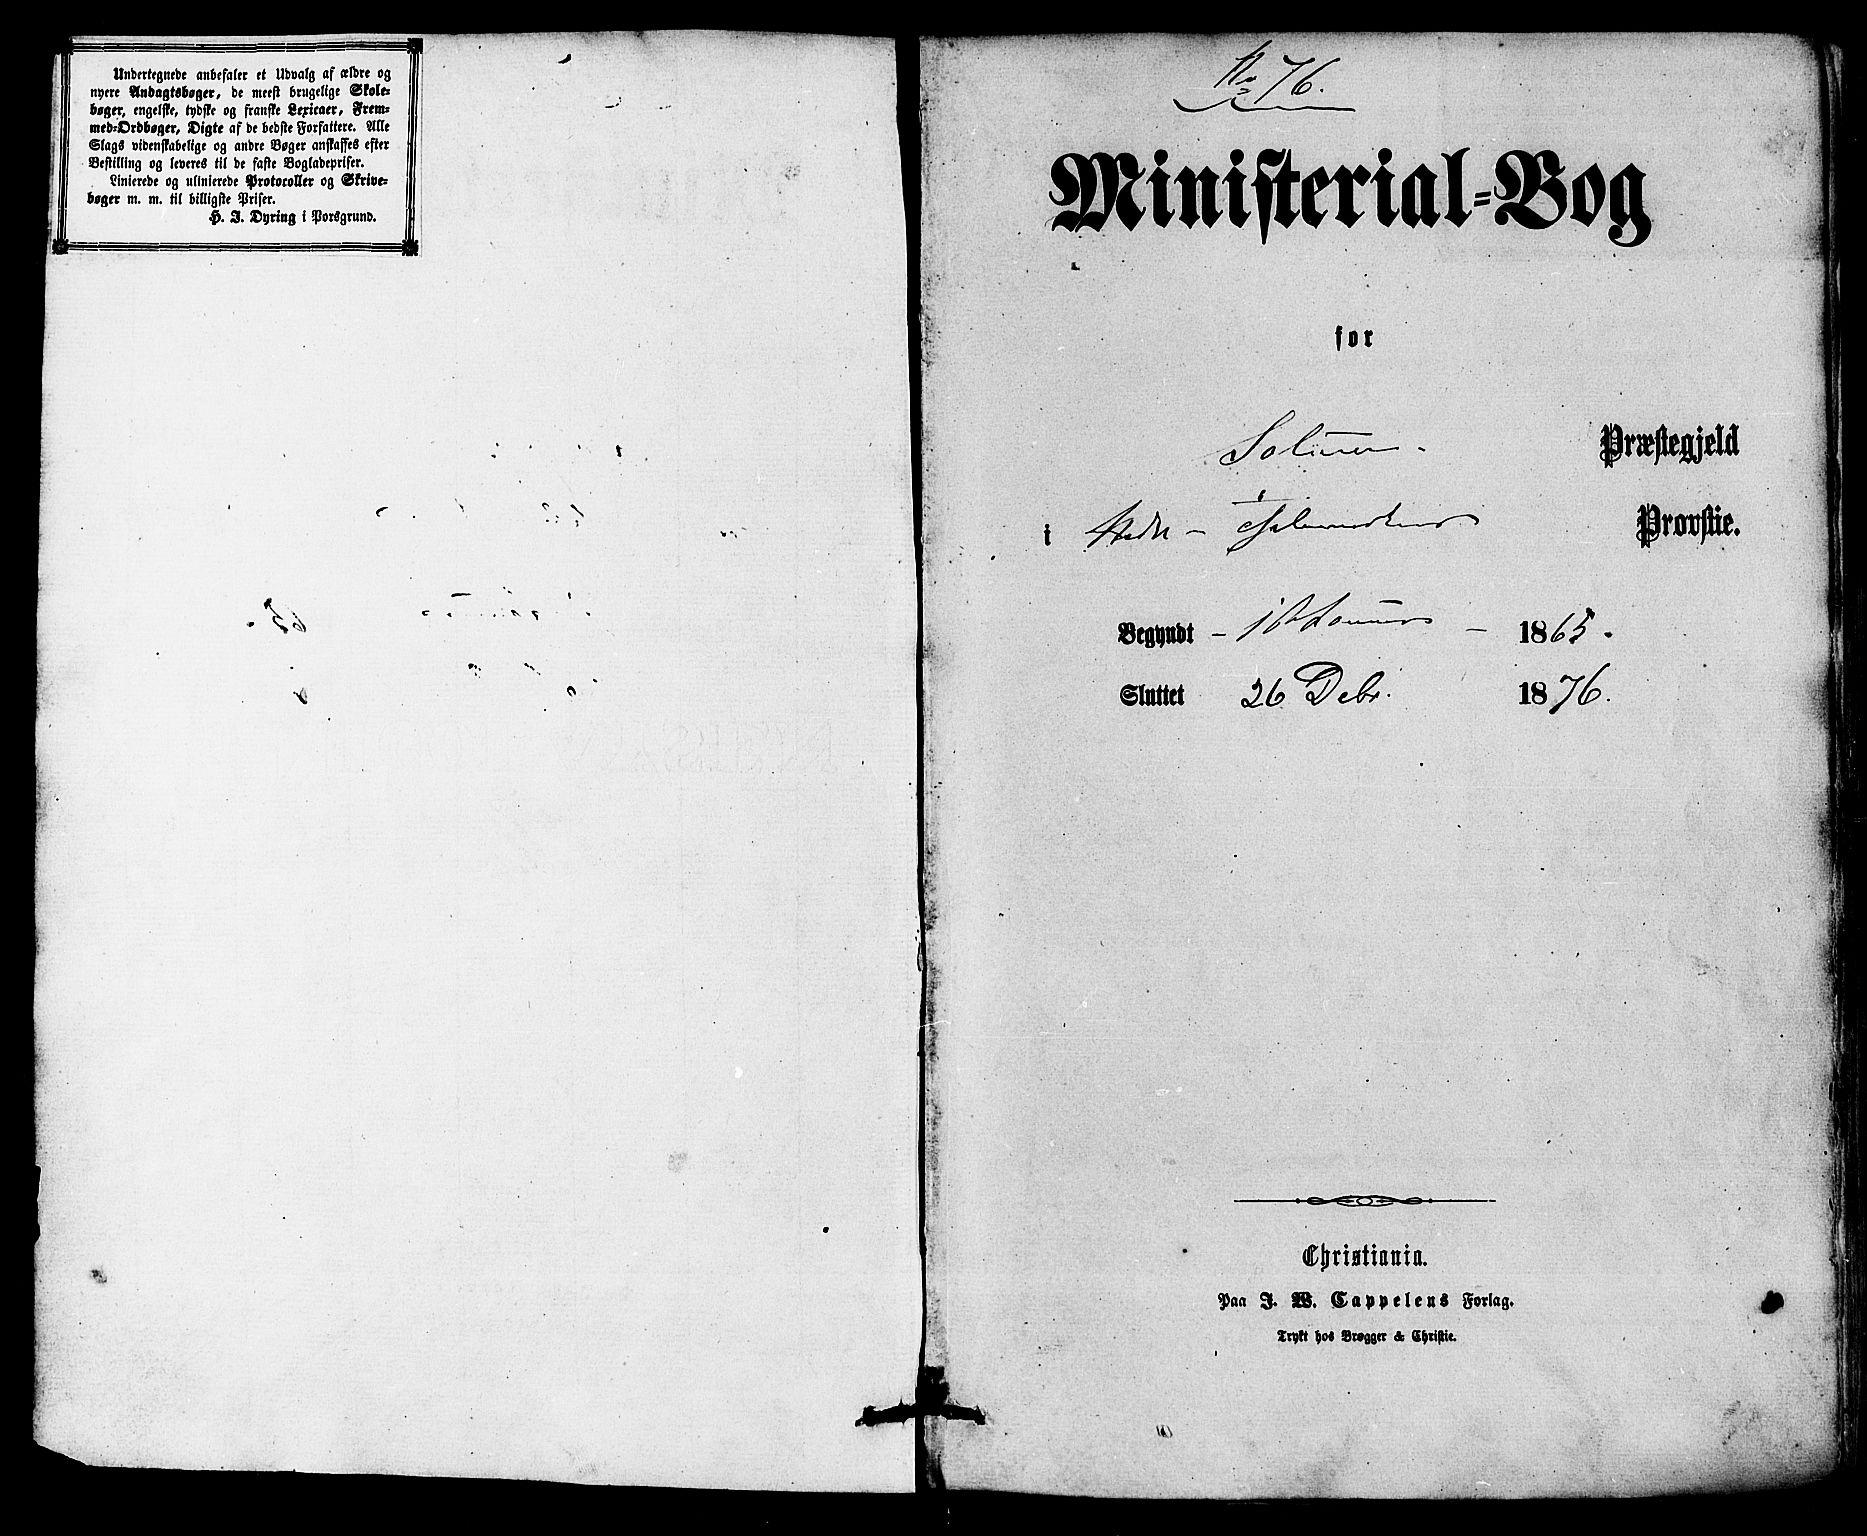 SAKO, Solum kirkebøker, F/Fa/L0008: Ministerialbok nr. I 8, 1865-1876